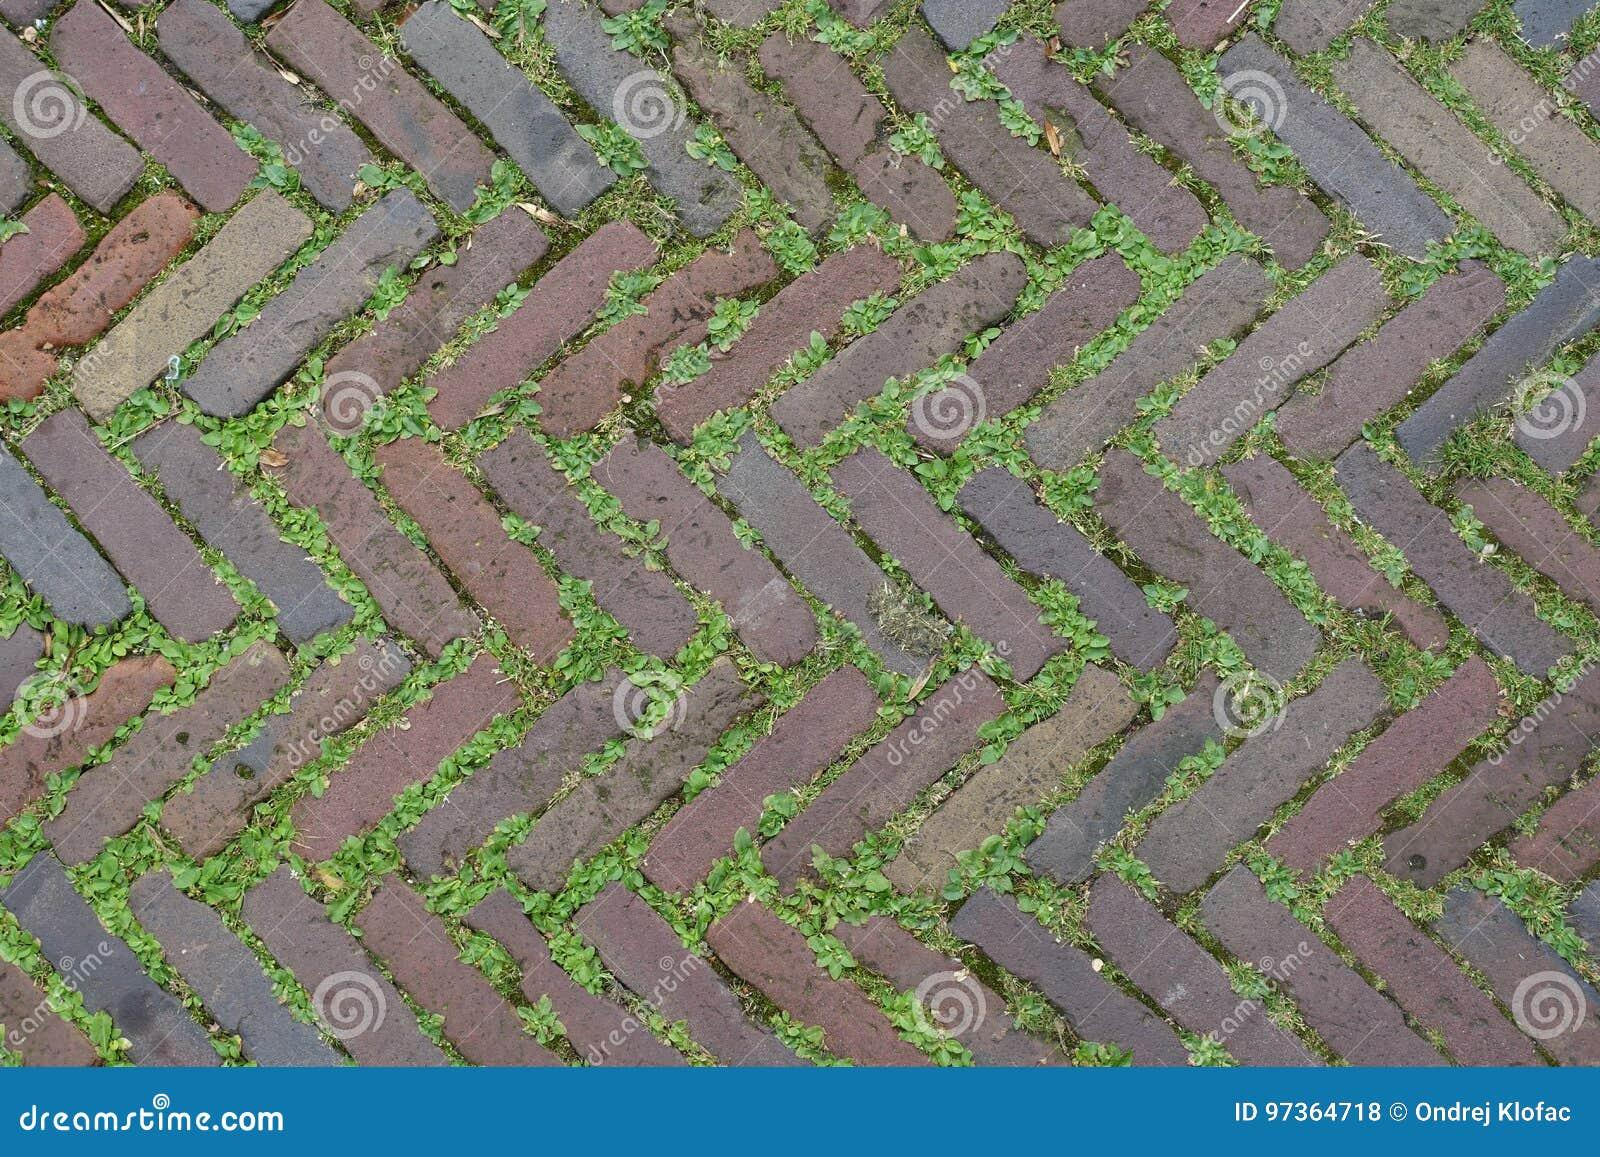 Red Brick Street Road Paving Arranged Across Herringbone Background